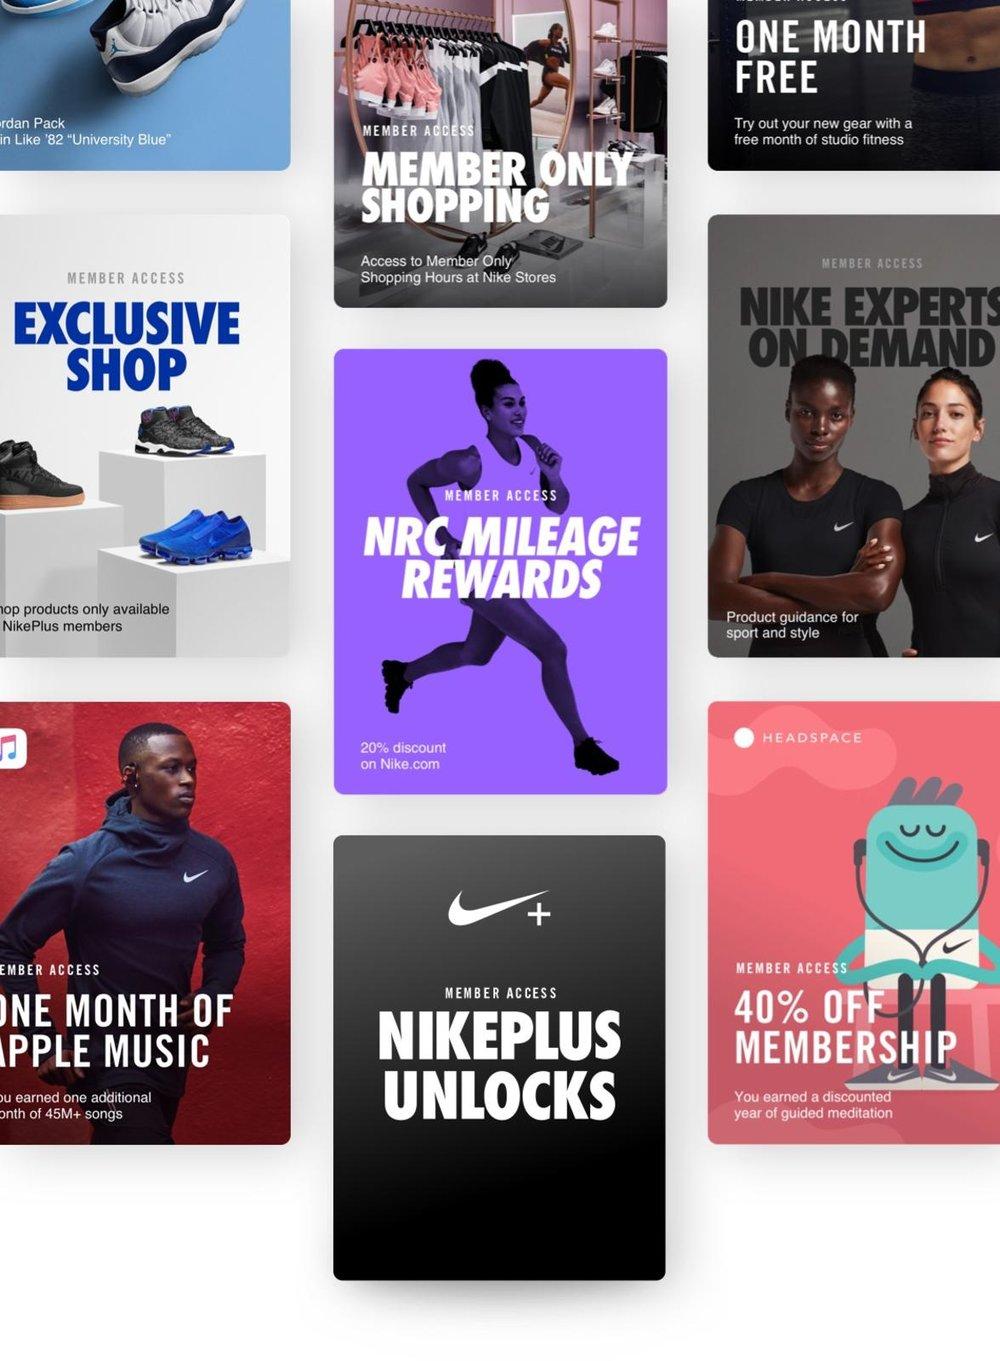 Photo: Nike News